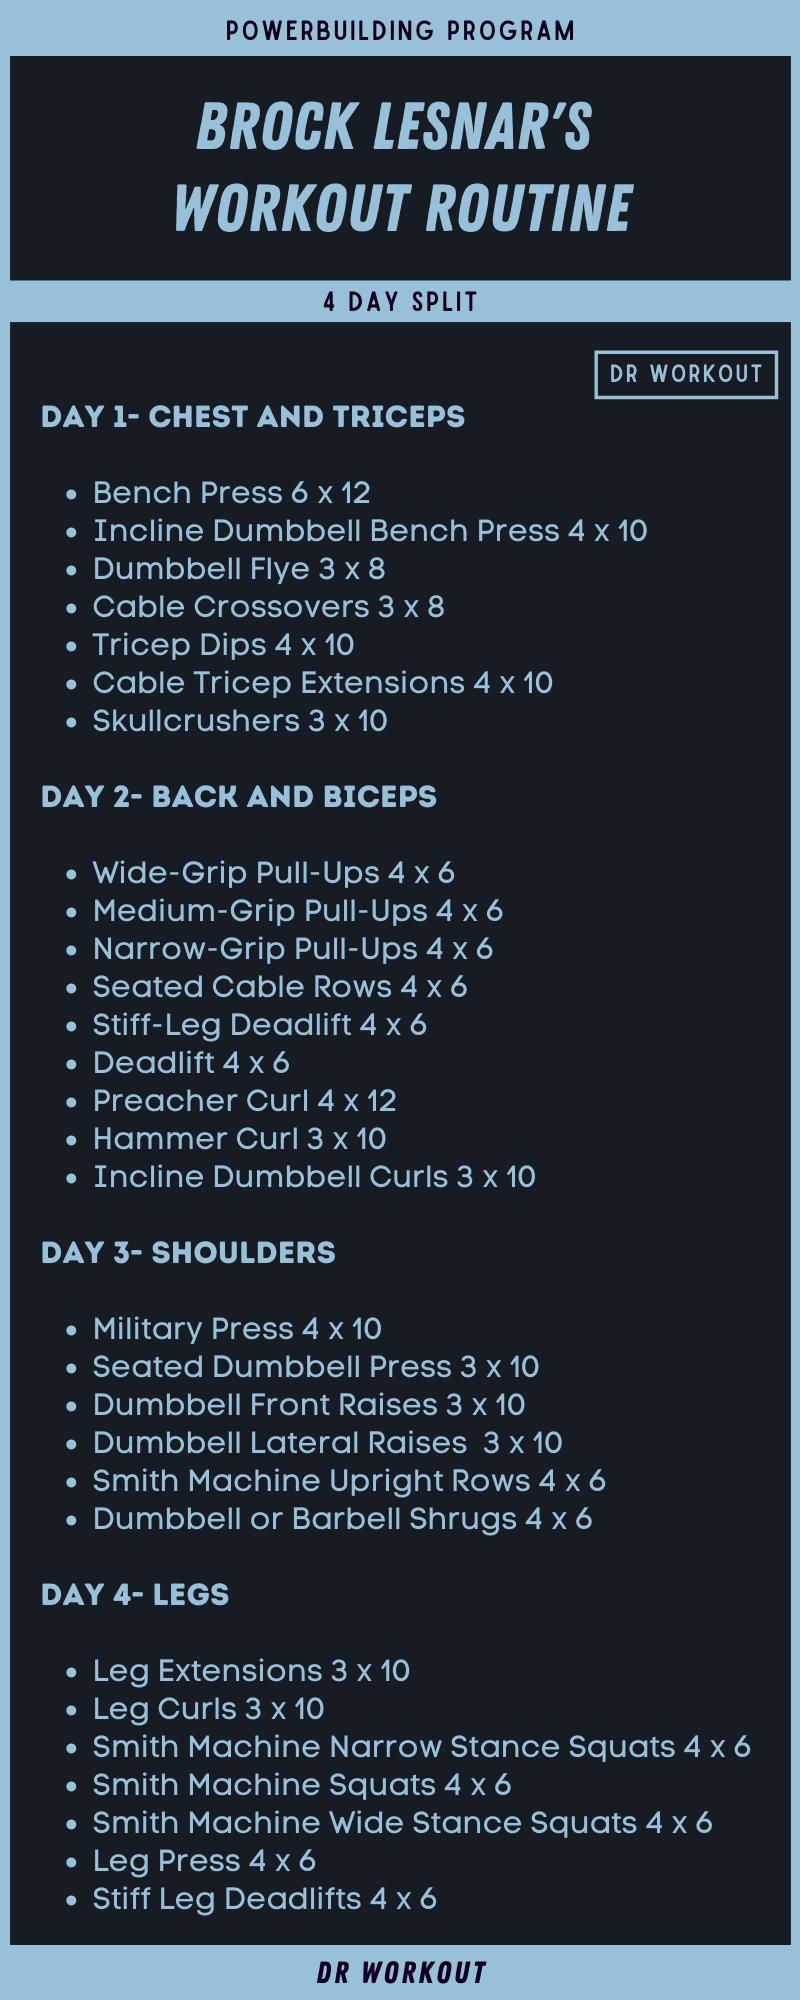 Brock Lesnar Workout Routine